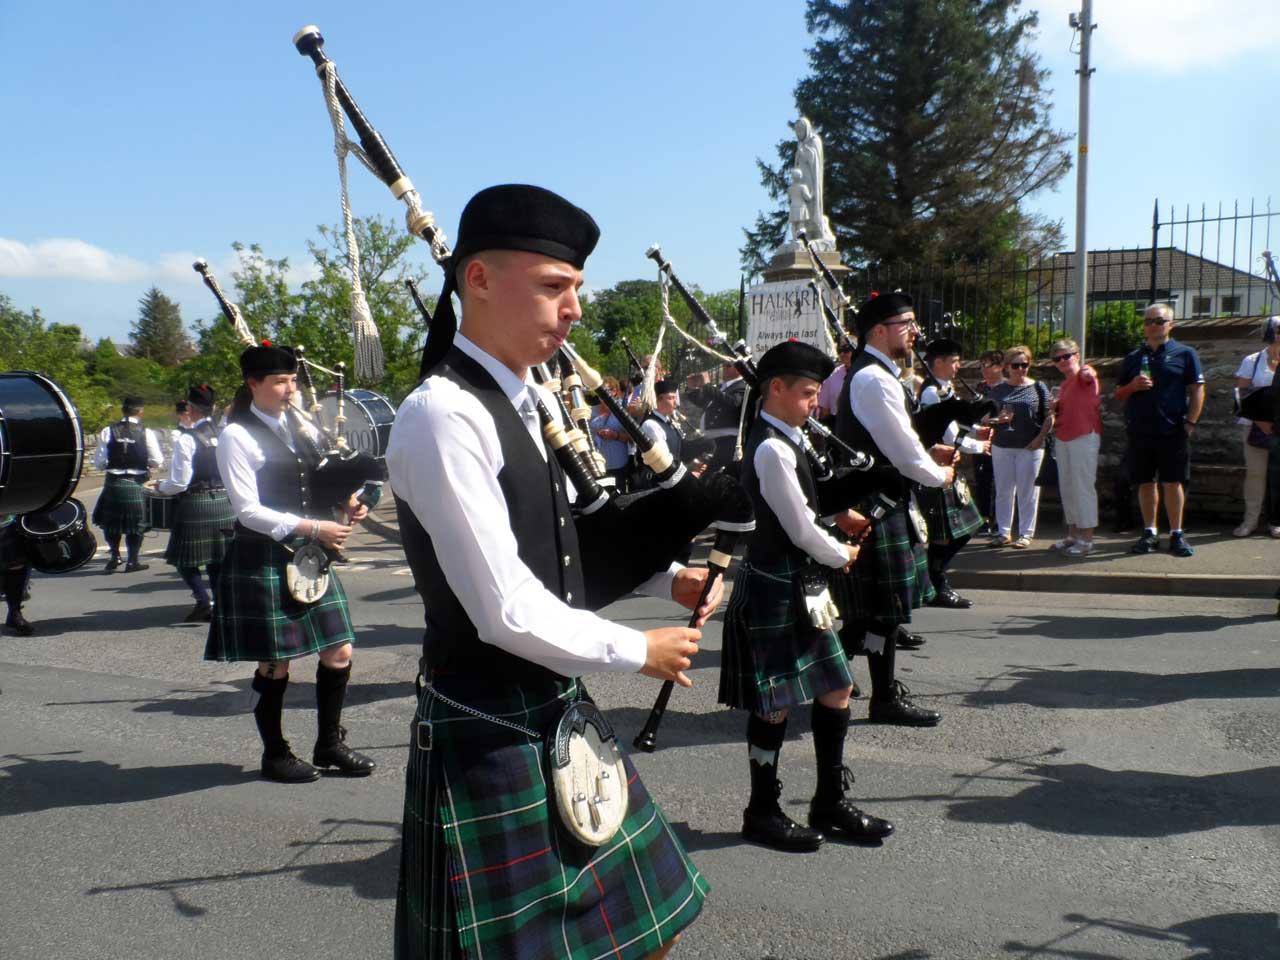 Photo: Halkirk Highland Games 2019